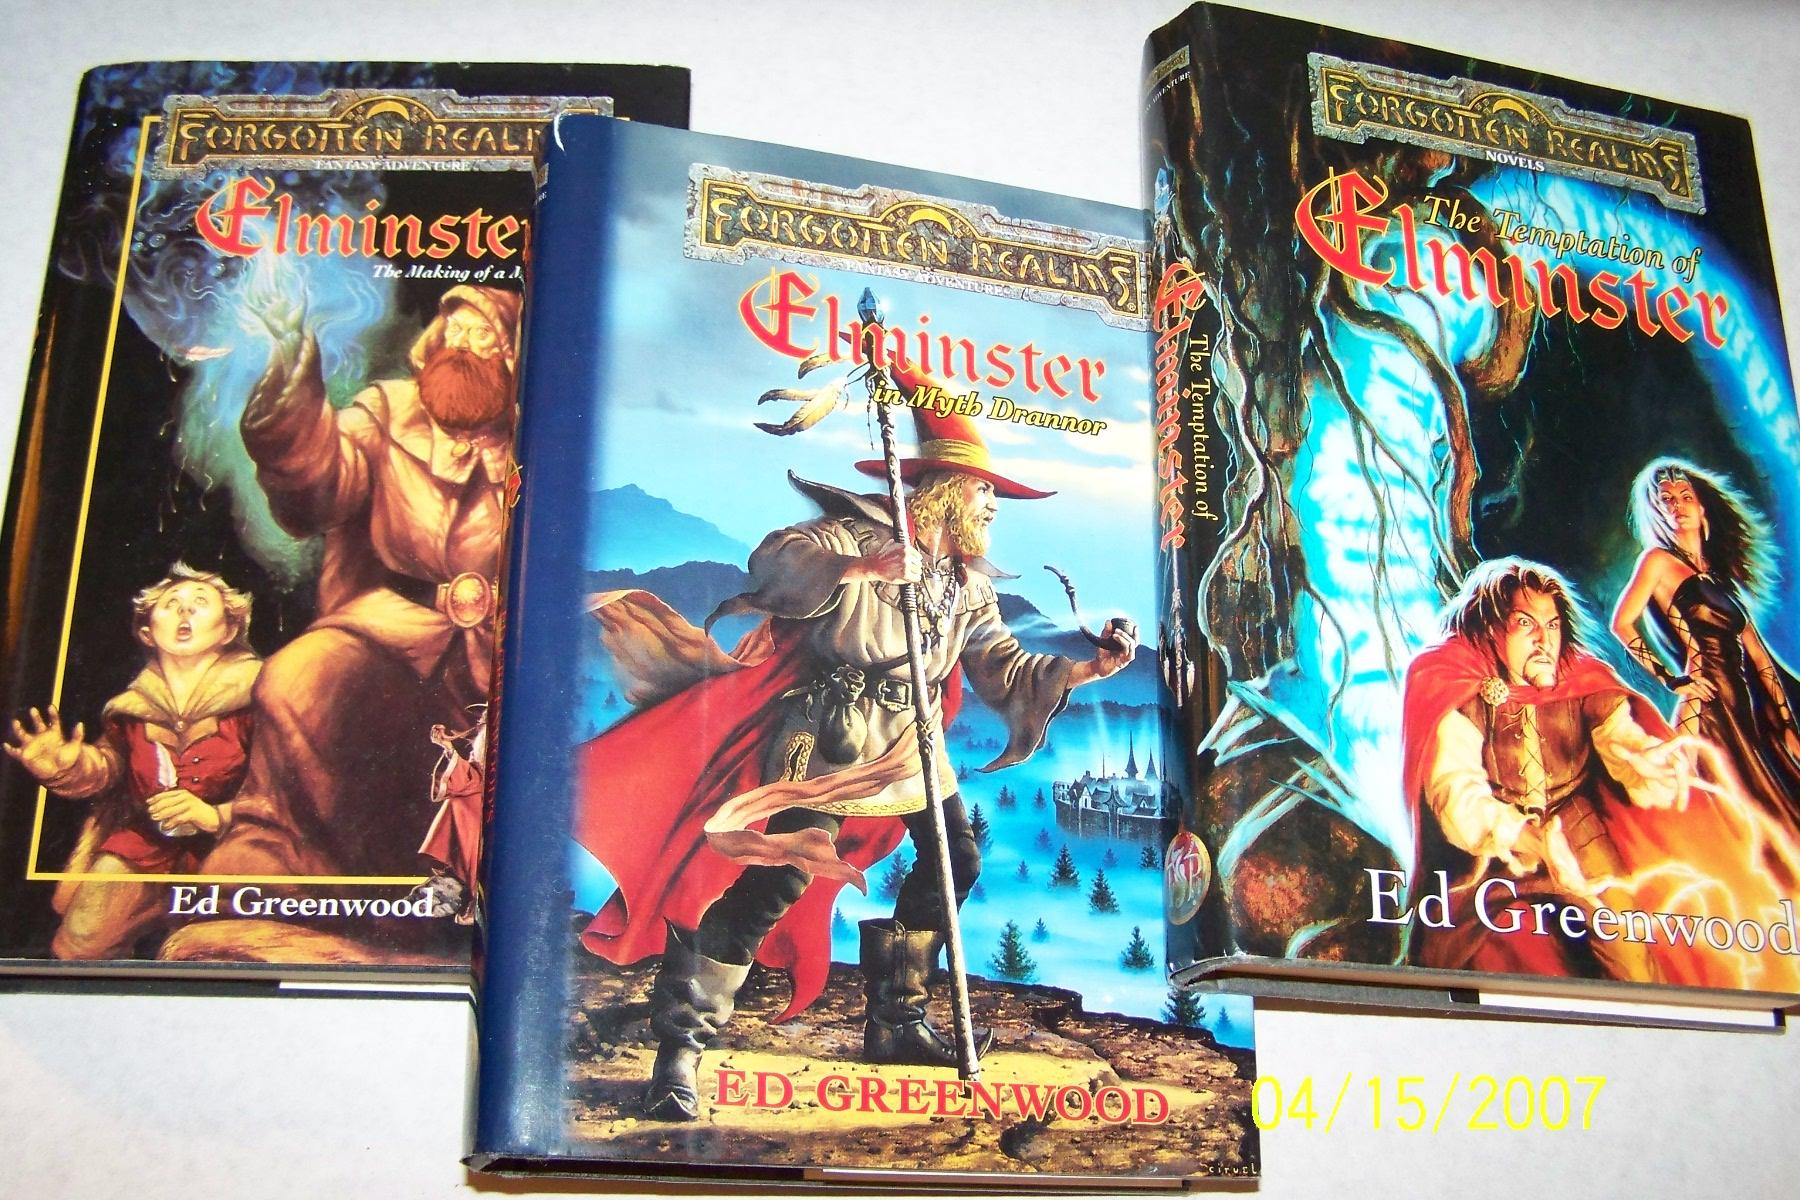 1998 fantasy novels